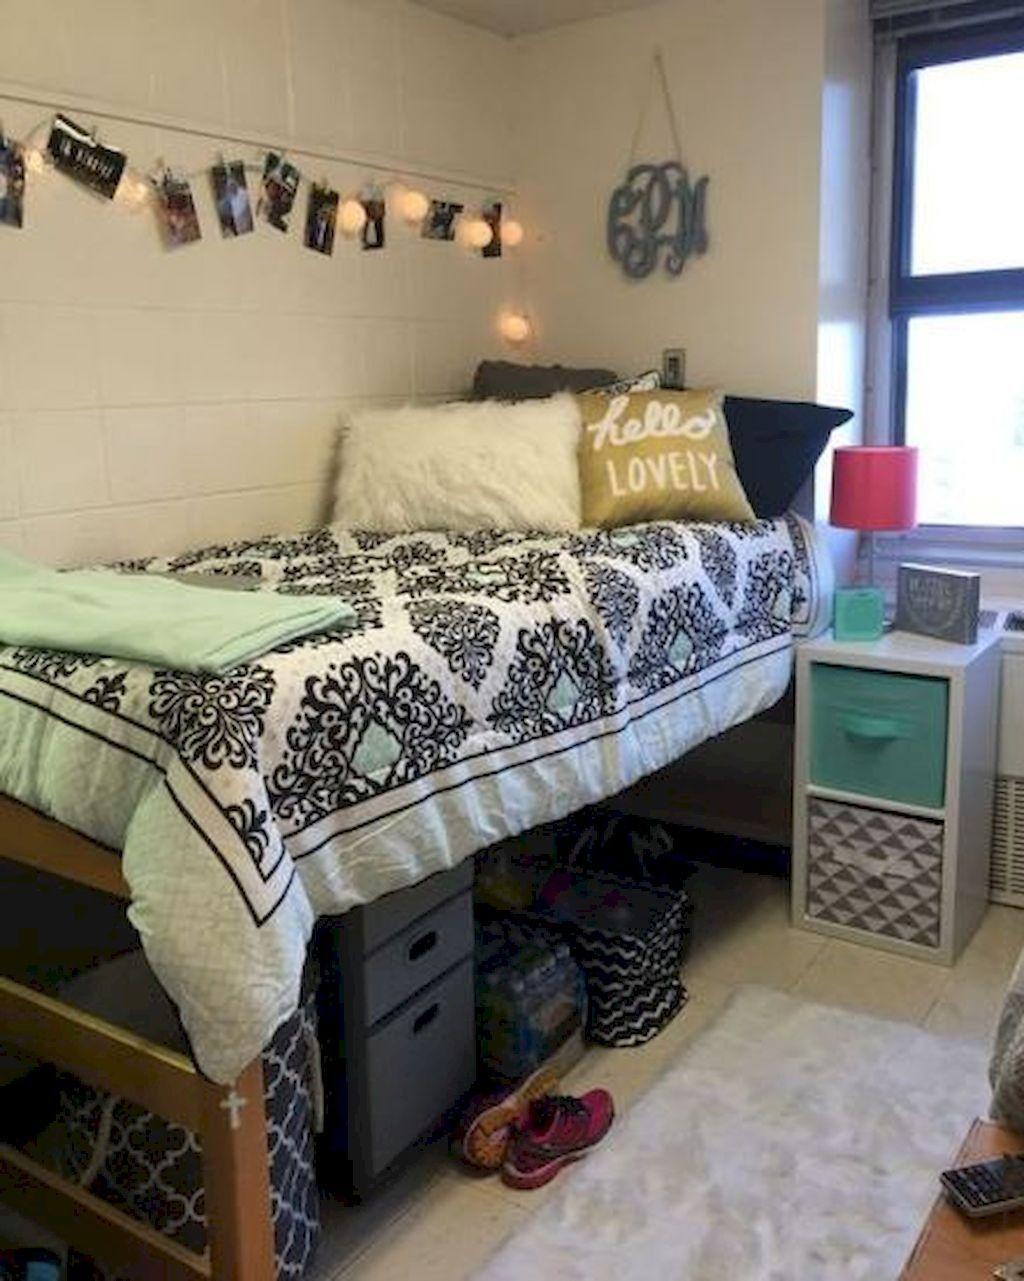 Get Dorm Room Decor Inspiration Choosing Multifunction Furniture For Decorating A Dorm Room Dormroom Howtode Girls Dorm Room Cute Dorm Rooms Cool Dorm Rooms